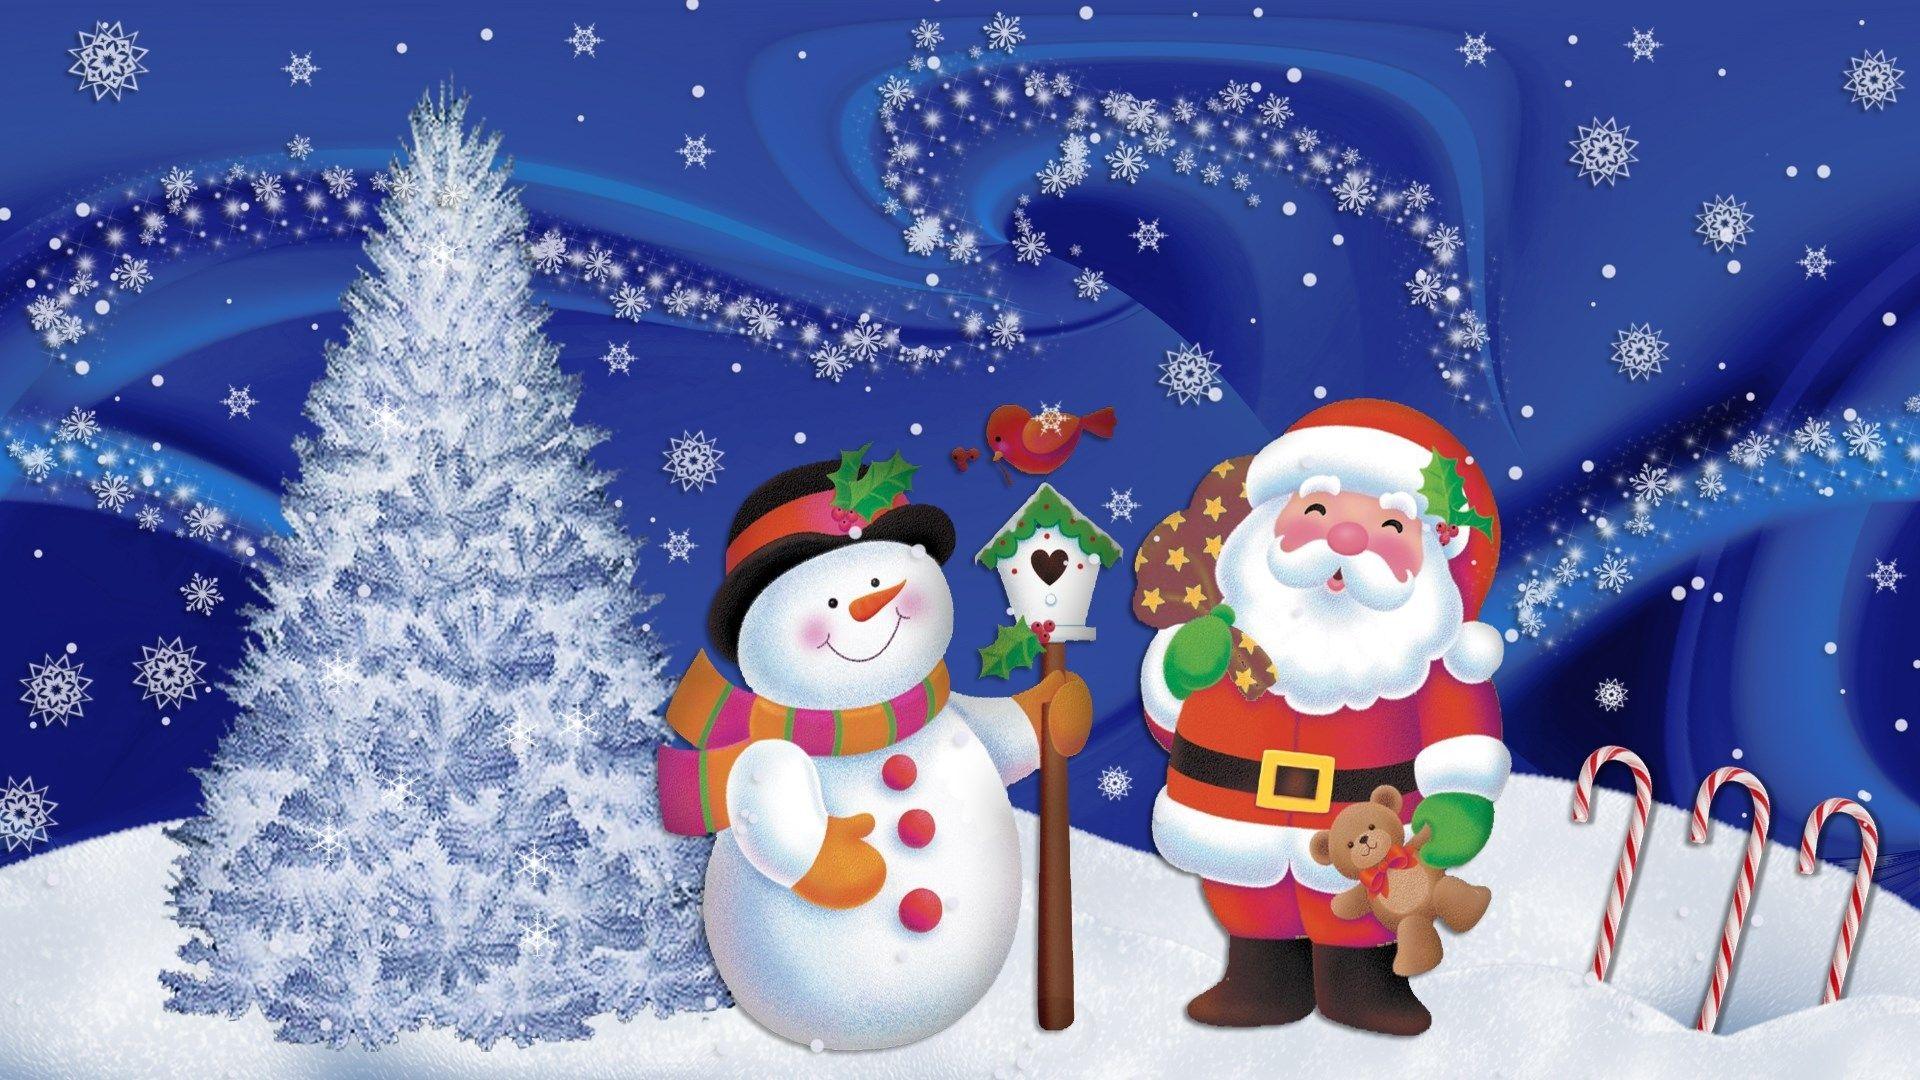 High Resolution Wallpapers Widescreen Christmas By Jones Archibald 2017 03 27 Merry Christmas Wallpaper Merry Christmas Images Christmas Wallpaper Free